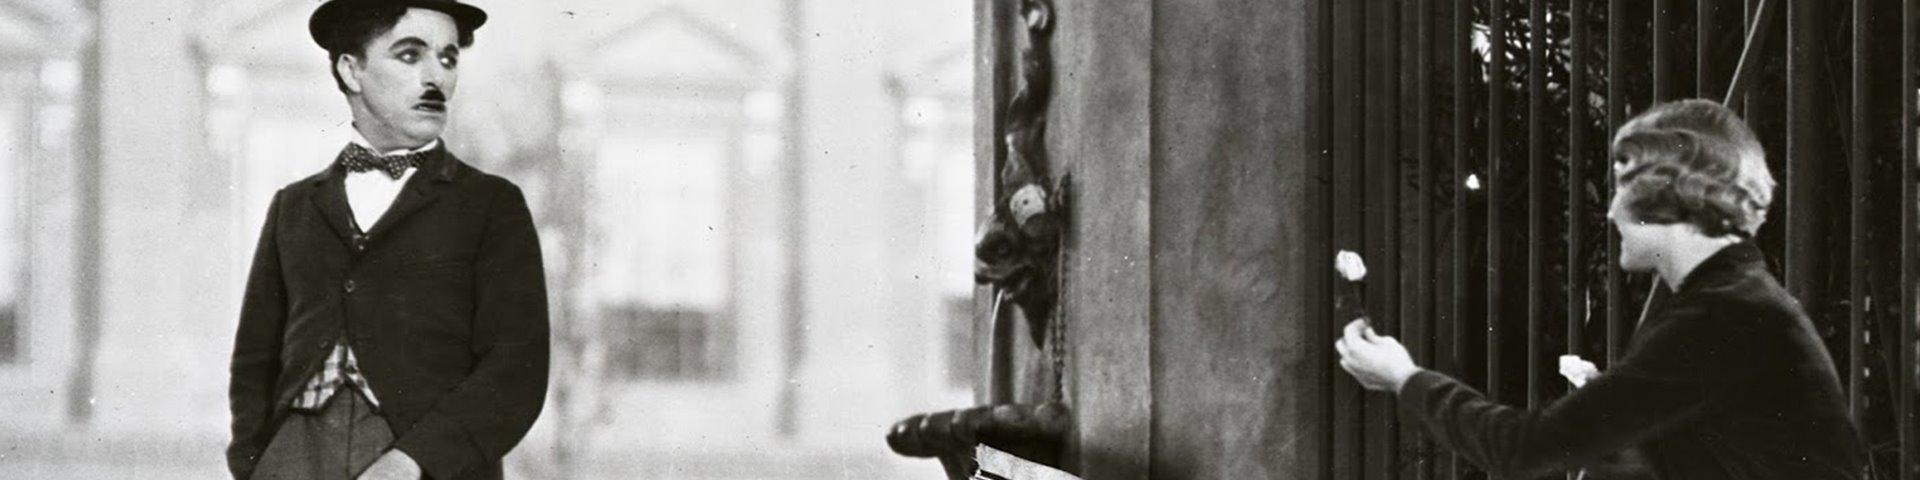 """City Lights"" (1931) by Charles Chaplin"